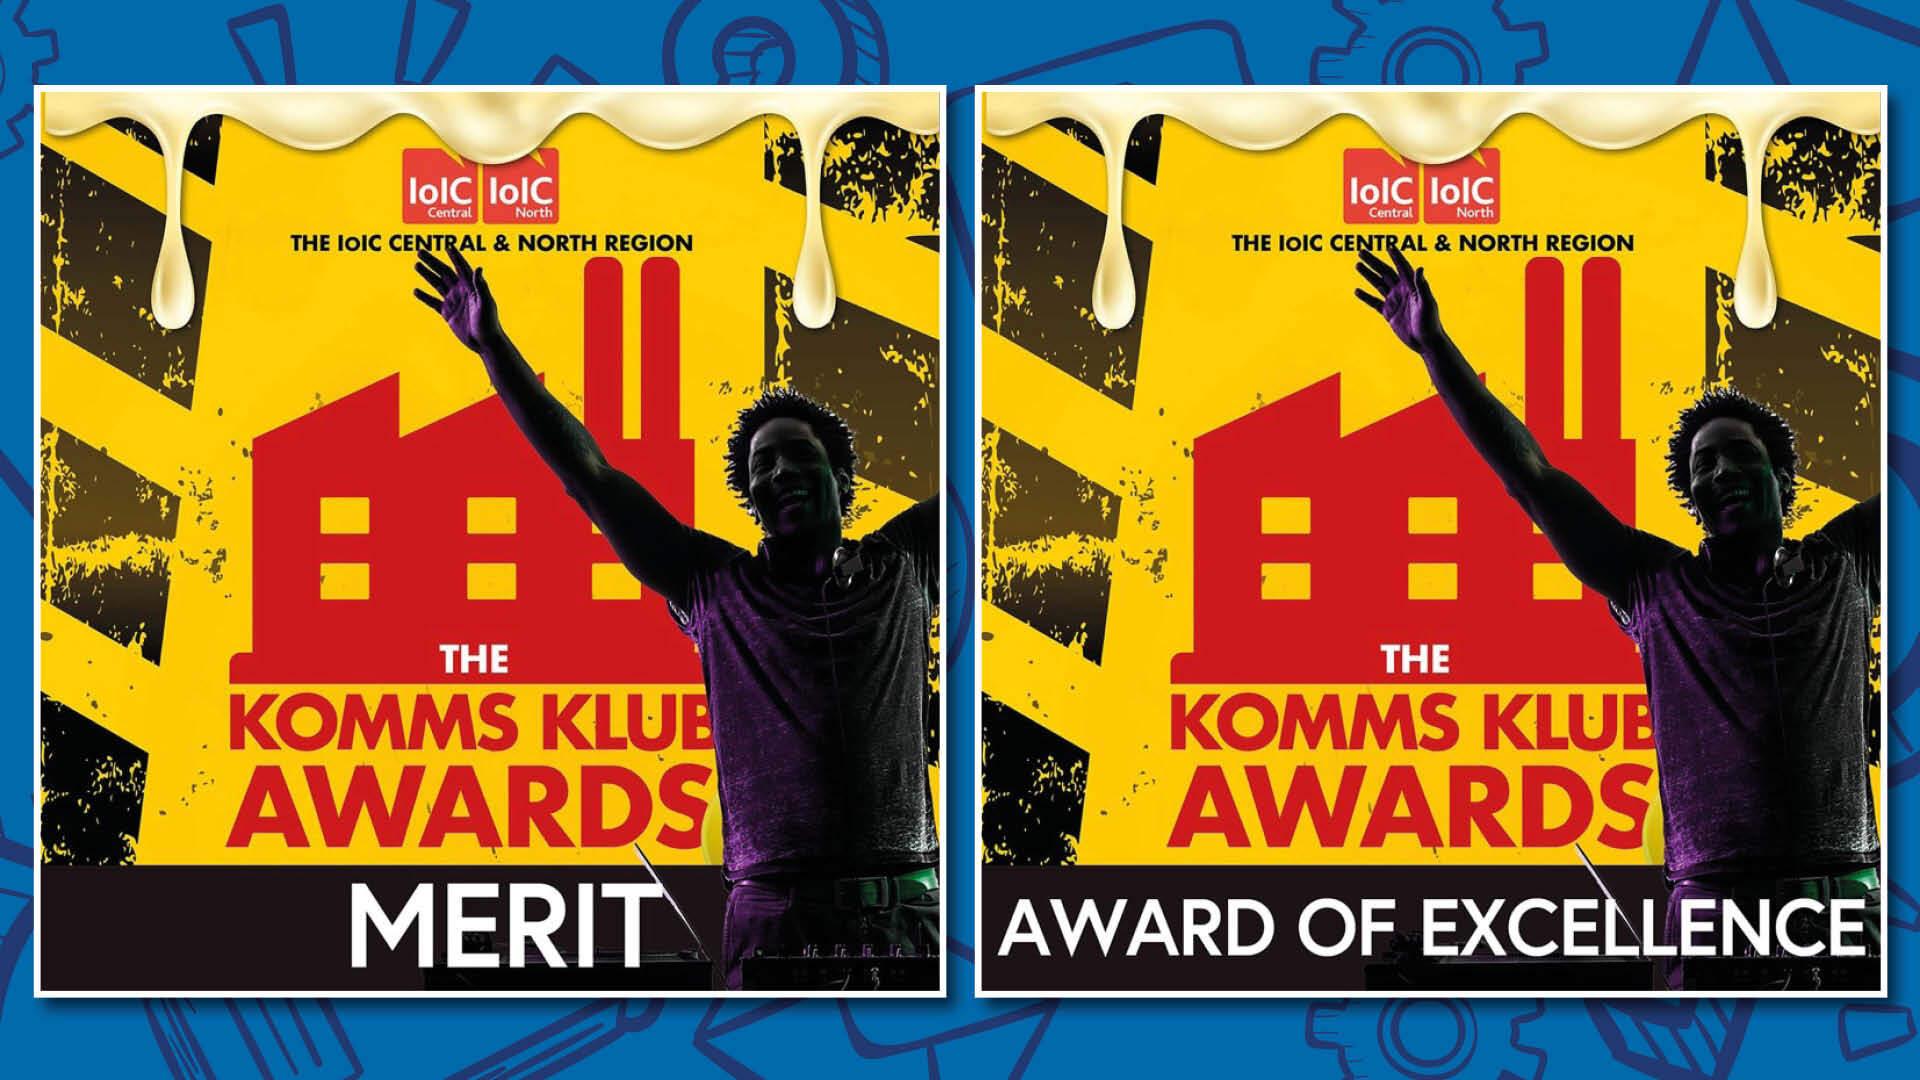 ioic awards logos